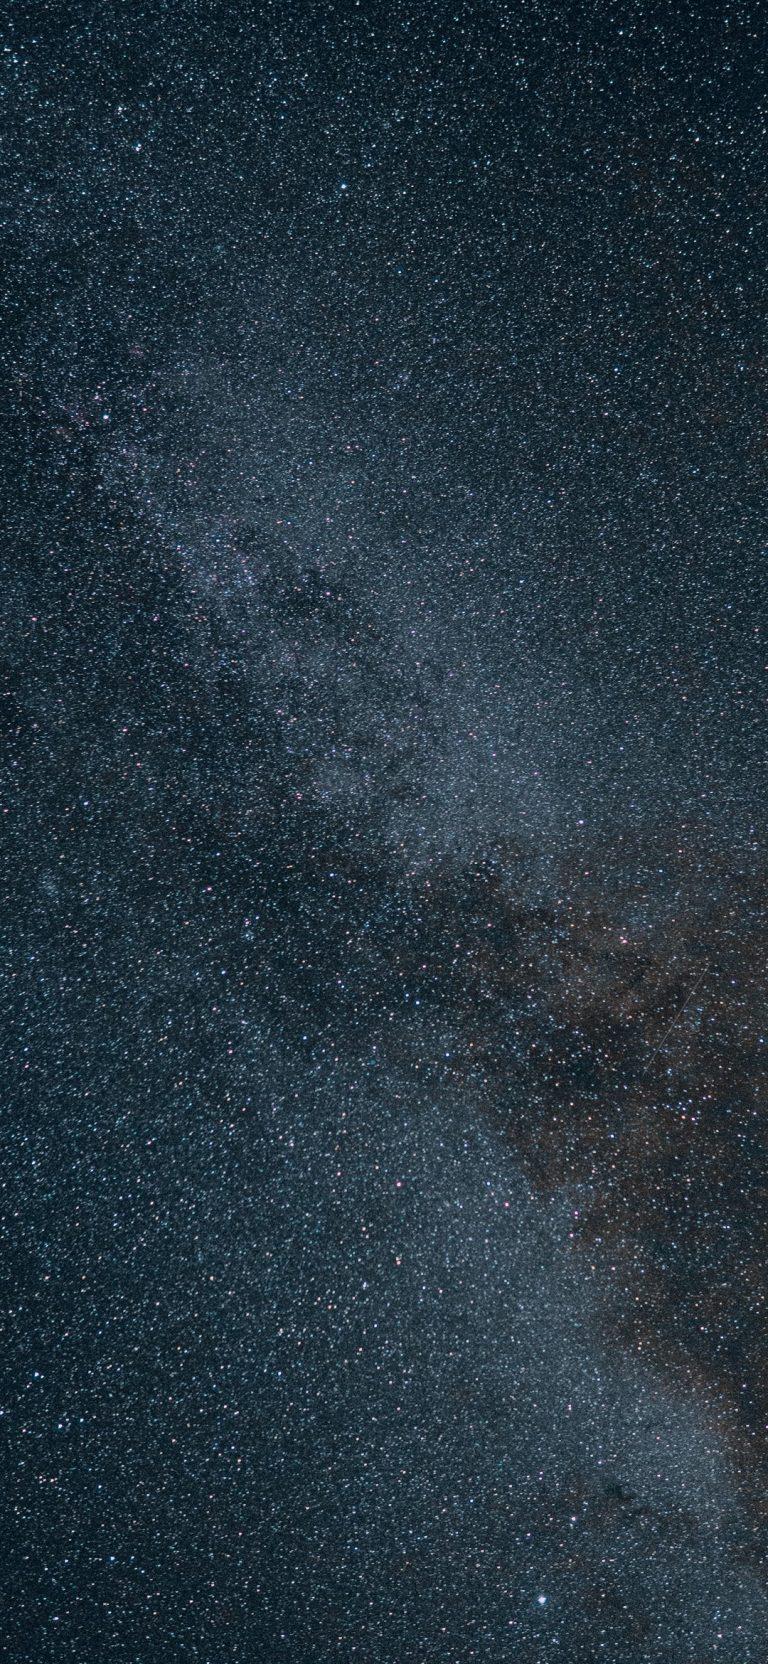 Space Phone Wallpaper 238 1080x2340 768x1664